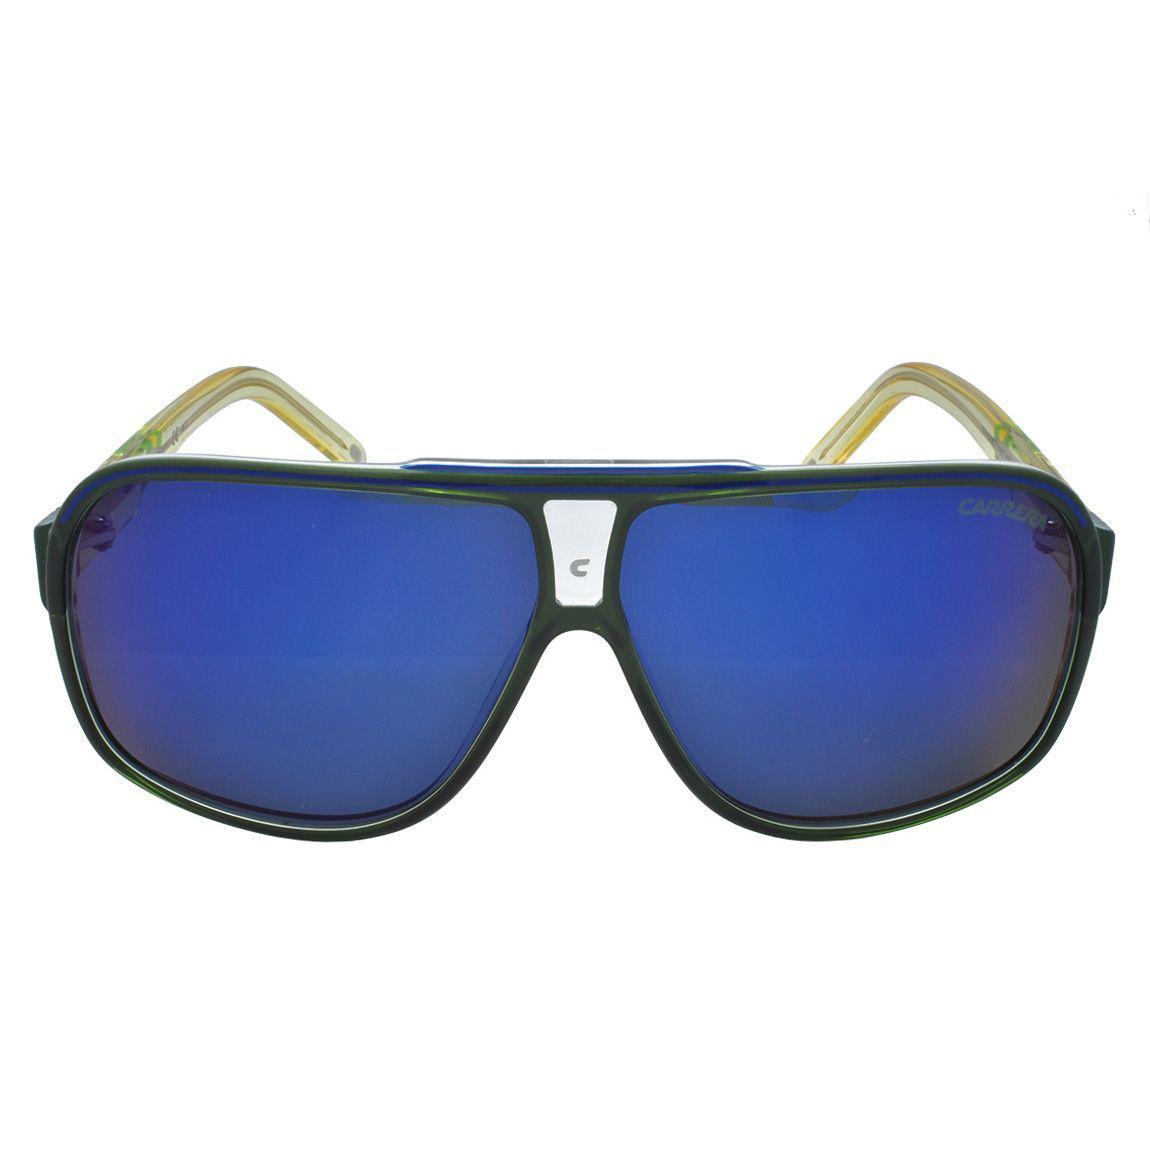 62ba7855e Óculos de Sol Carrera Copa Masculino GRANDPRIX2/W/C - Acetato Verde e Amarelo  Translucido R$ 449,00 à vista. Adicionar à sacola